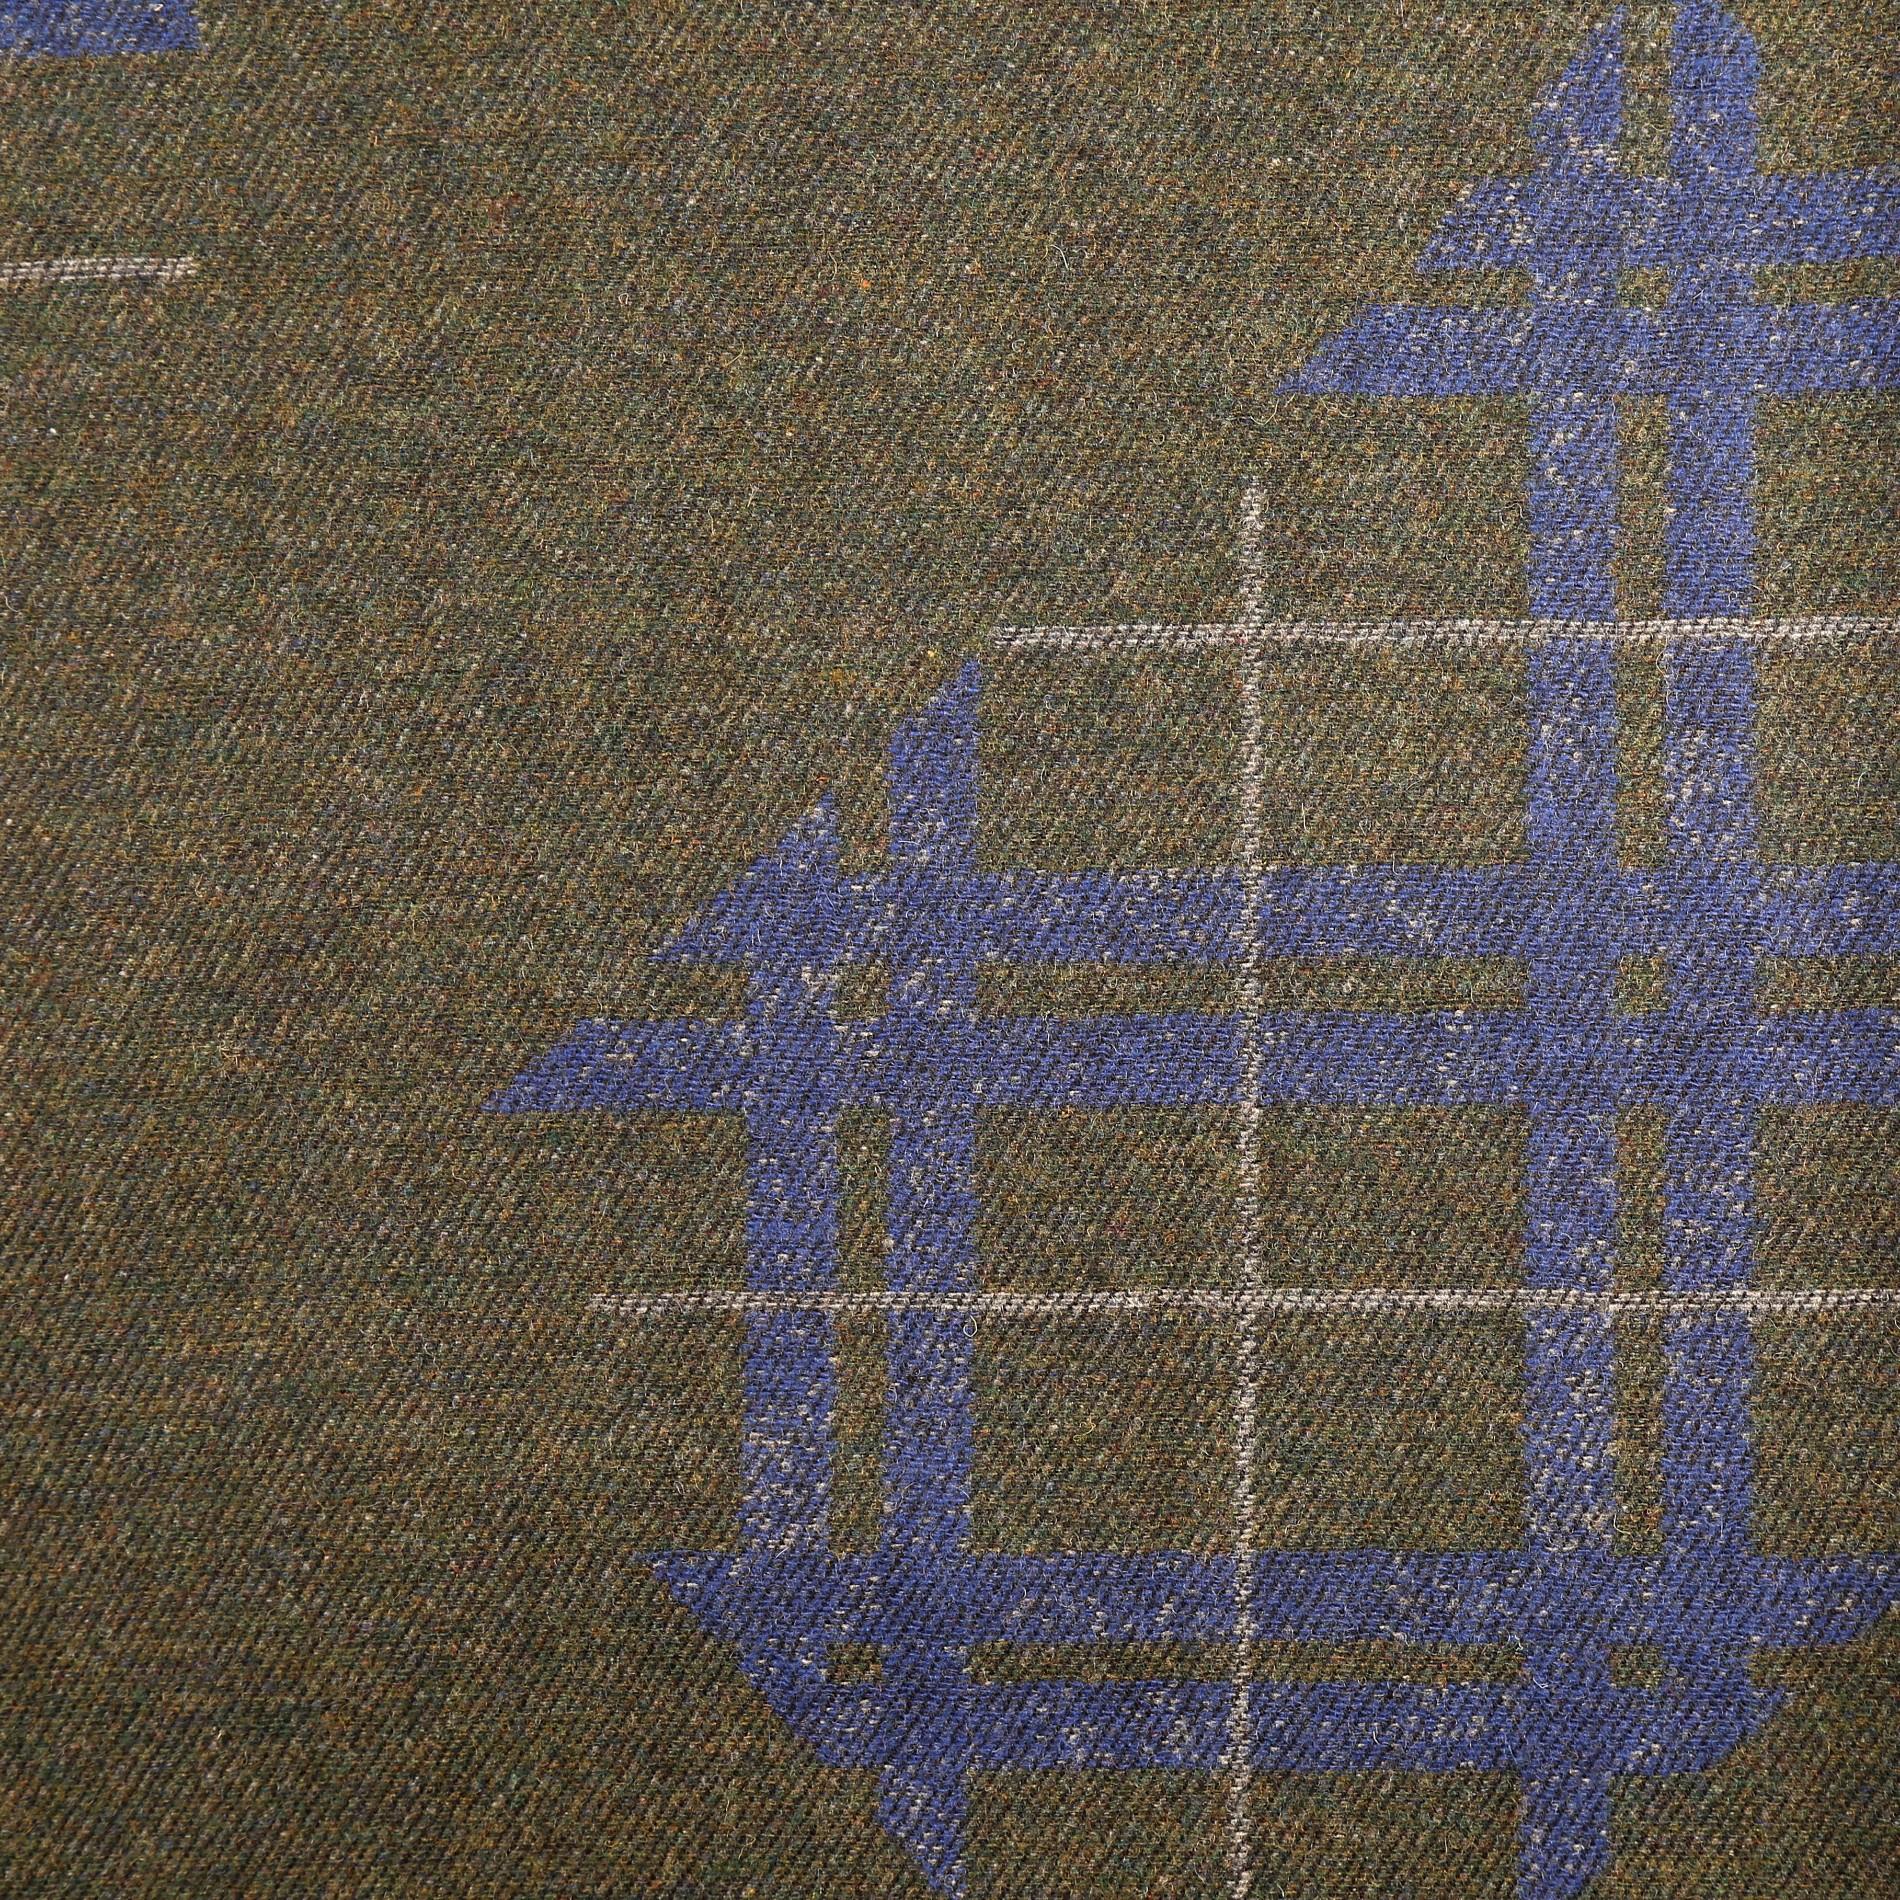 Wollen Fabric